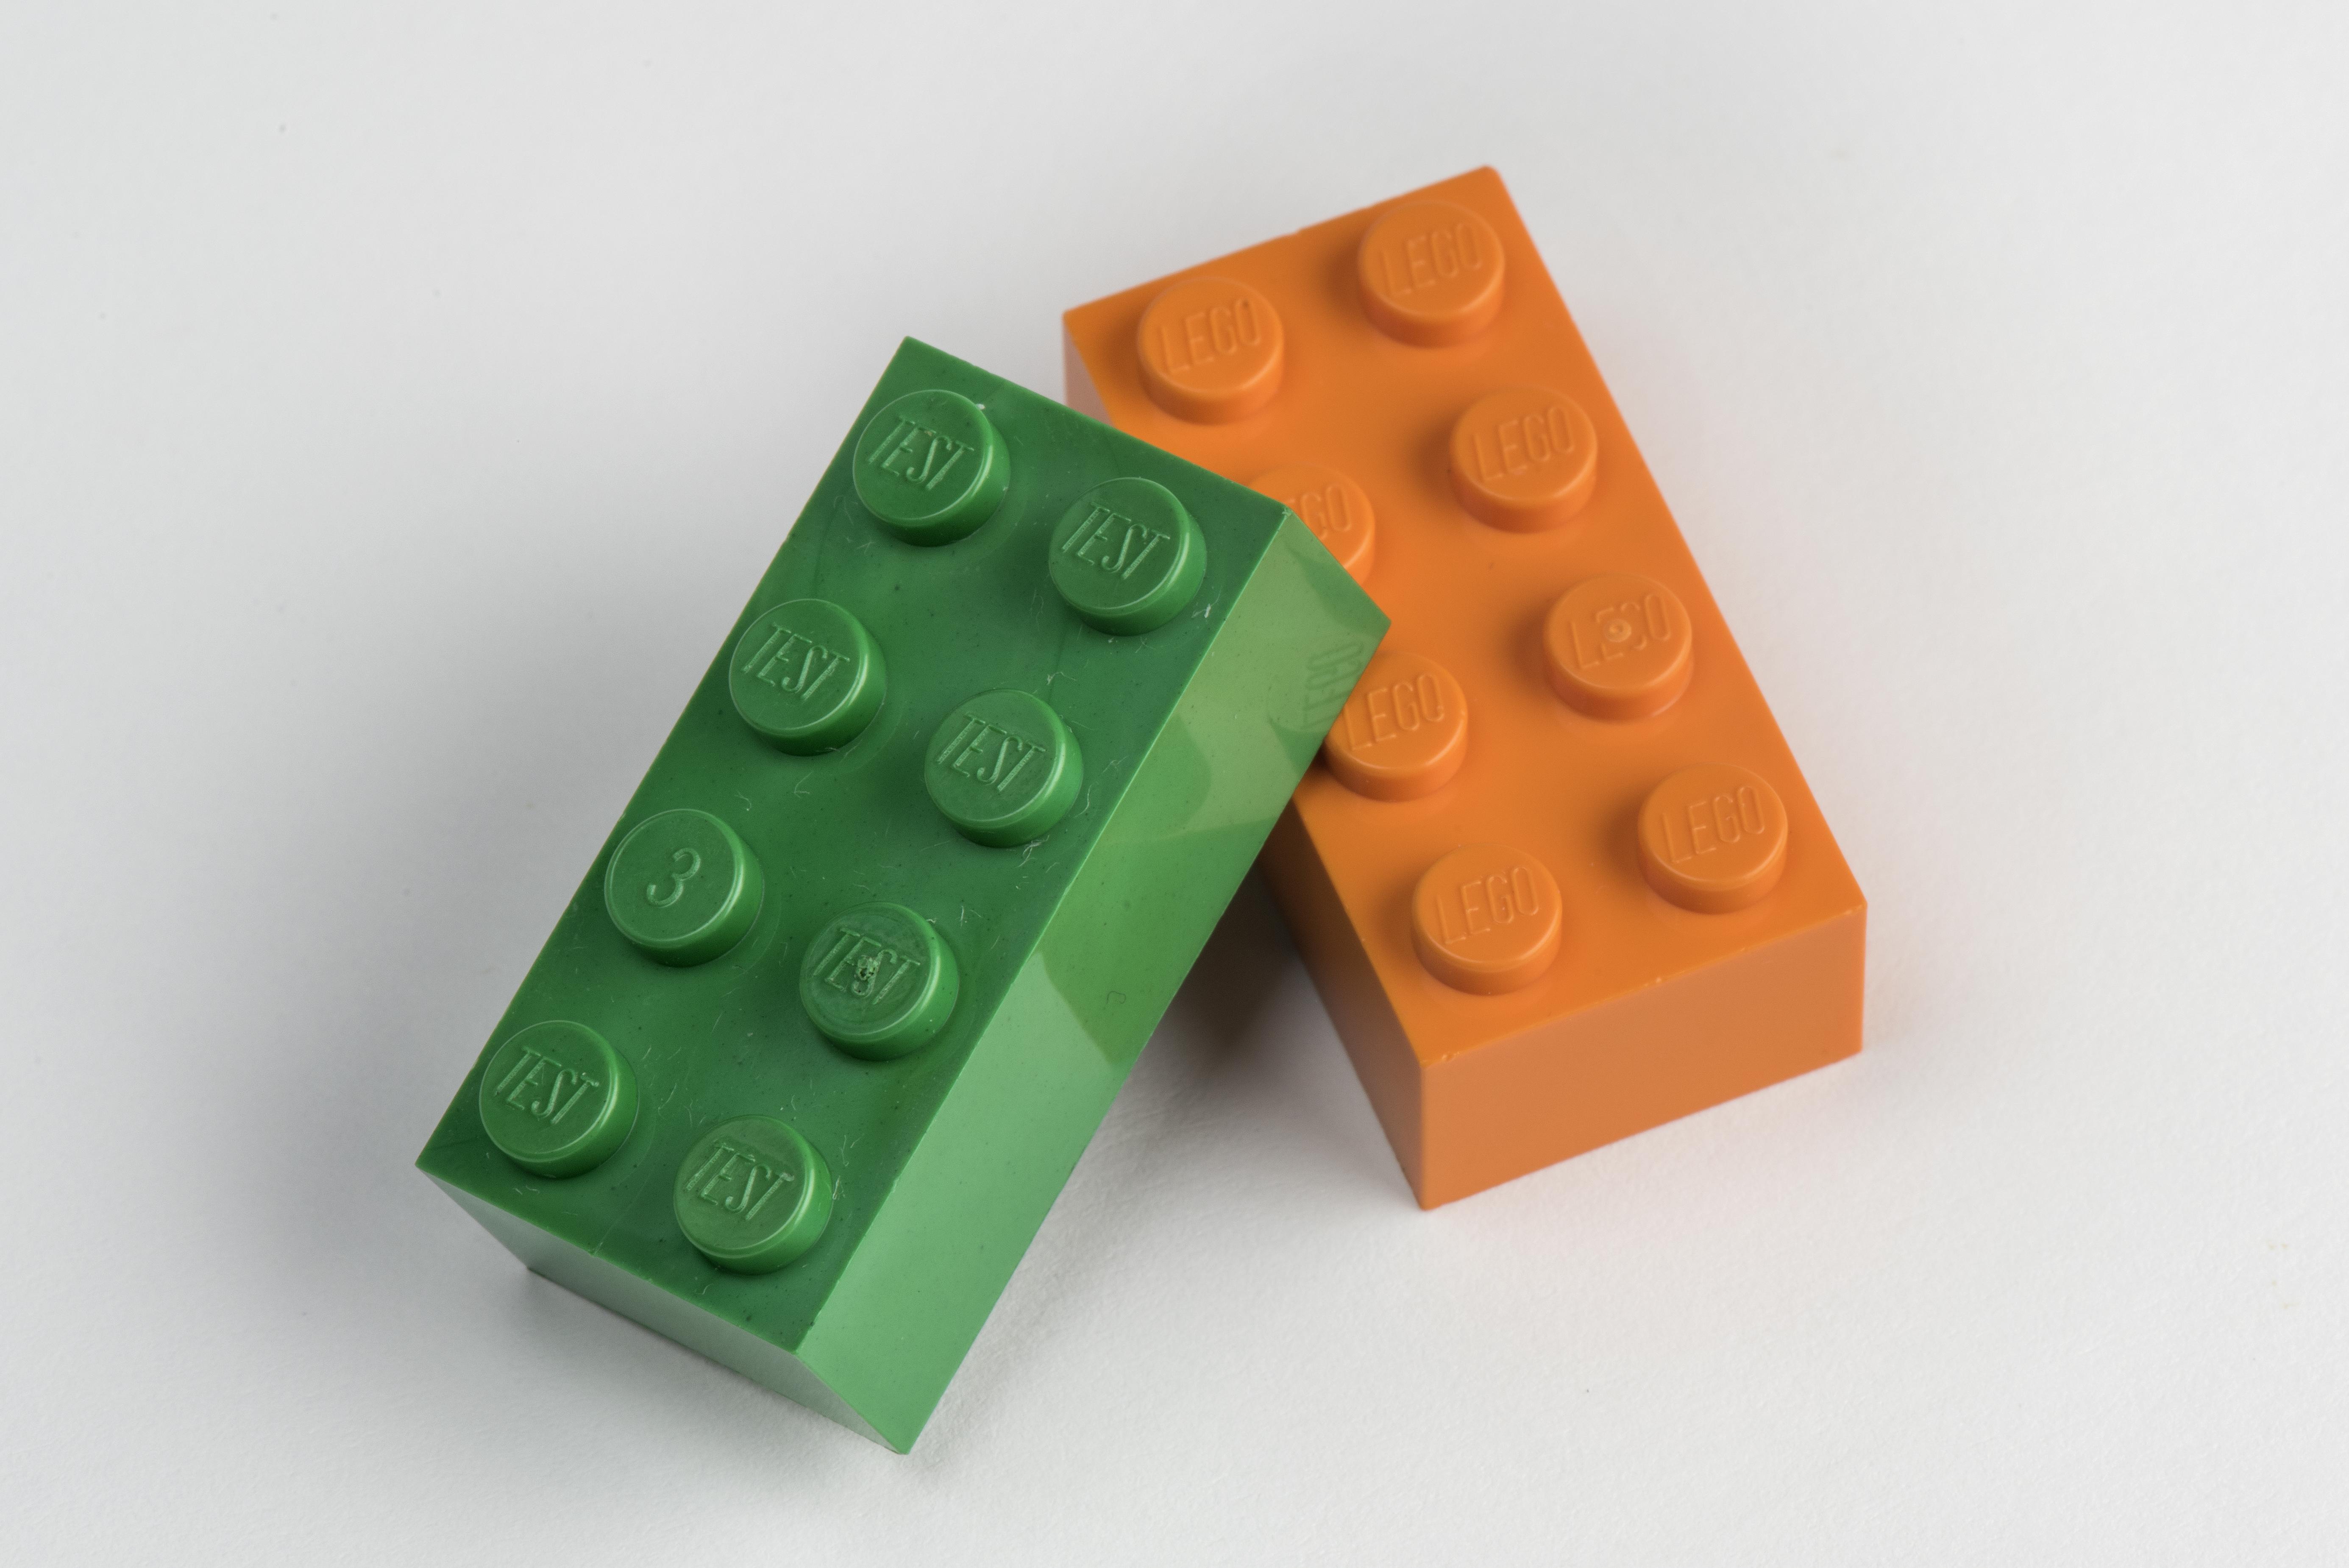 Lego test plastics